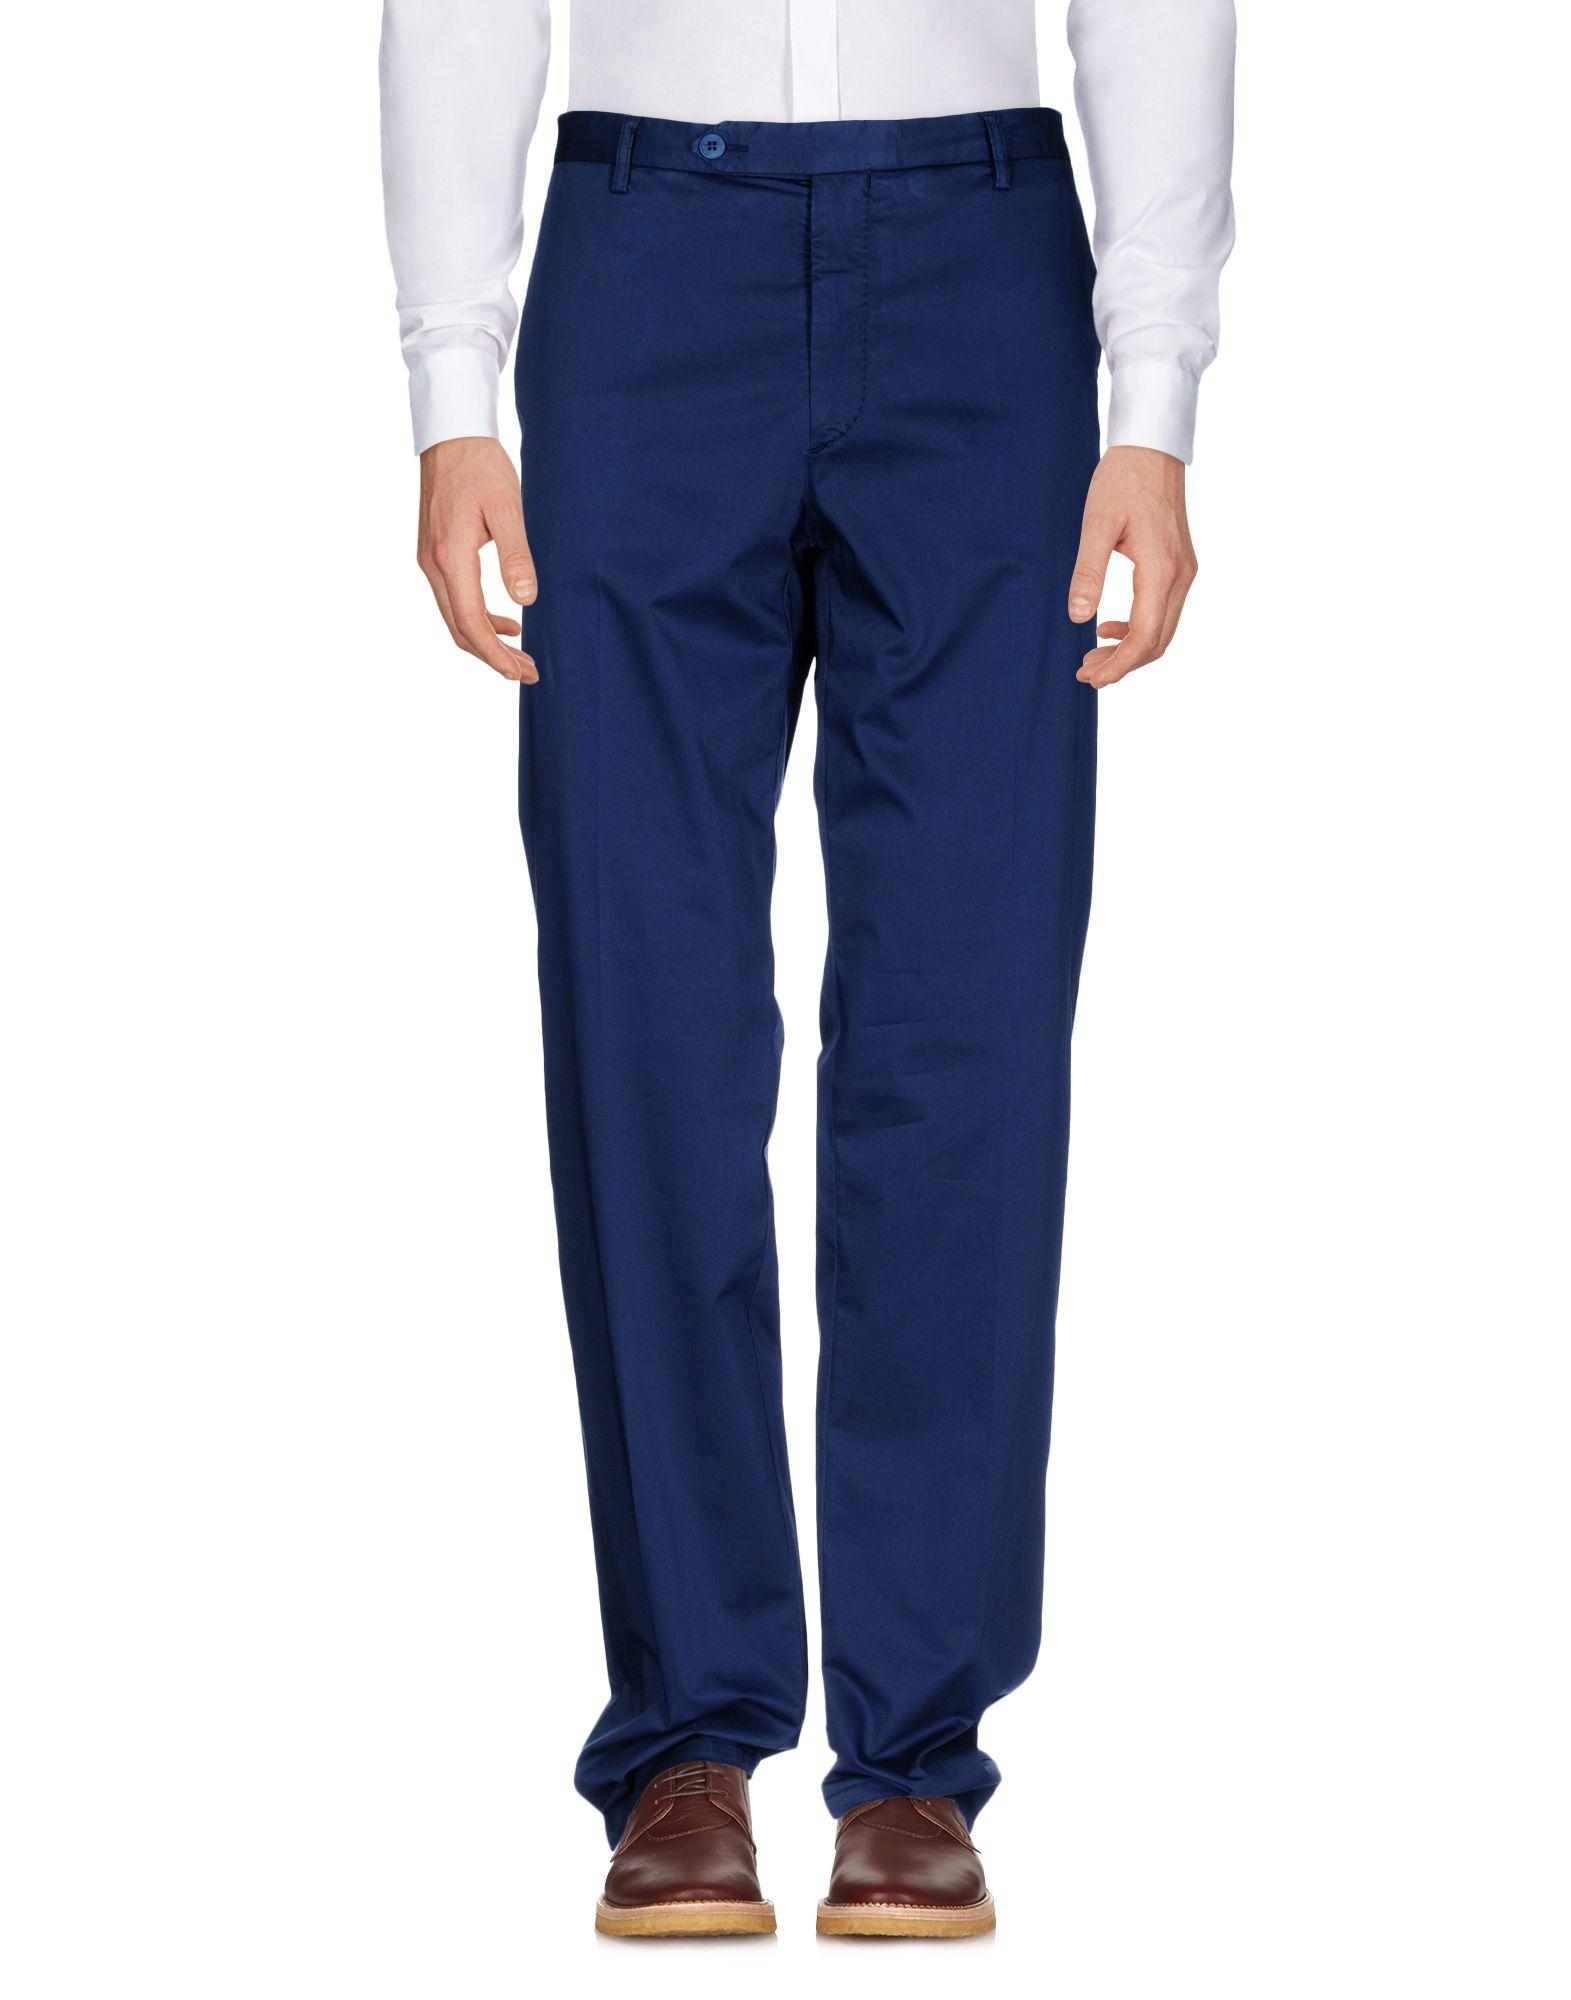 Pantalone Rotasport Uomo - Acquista online su